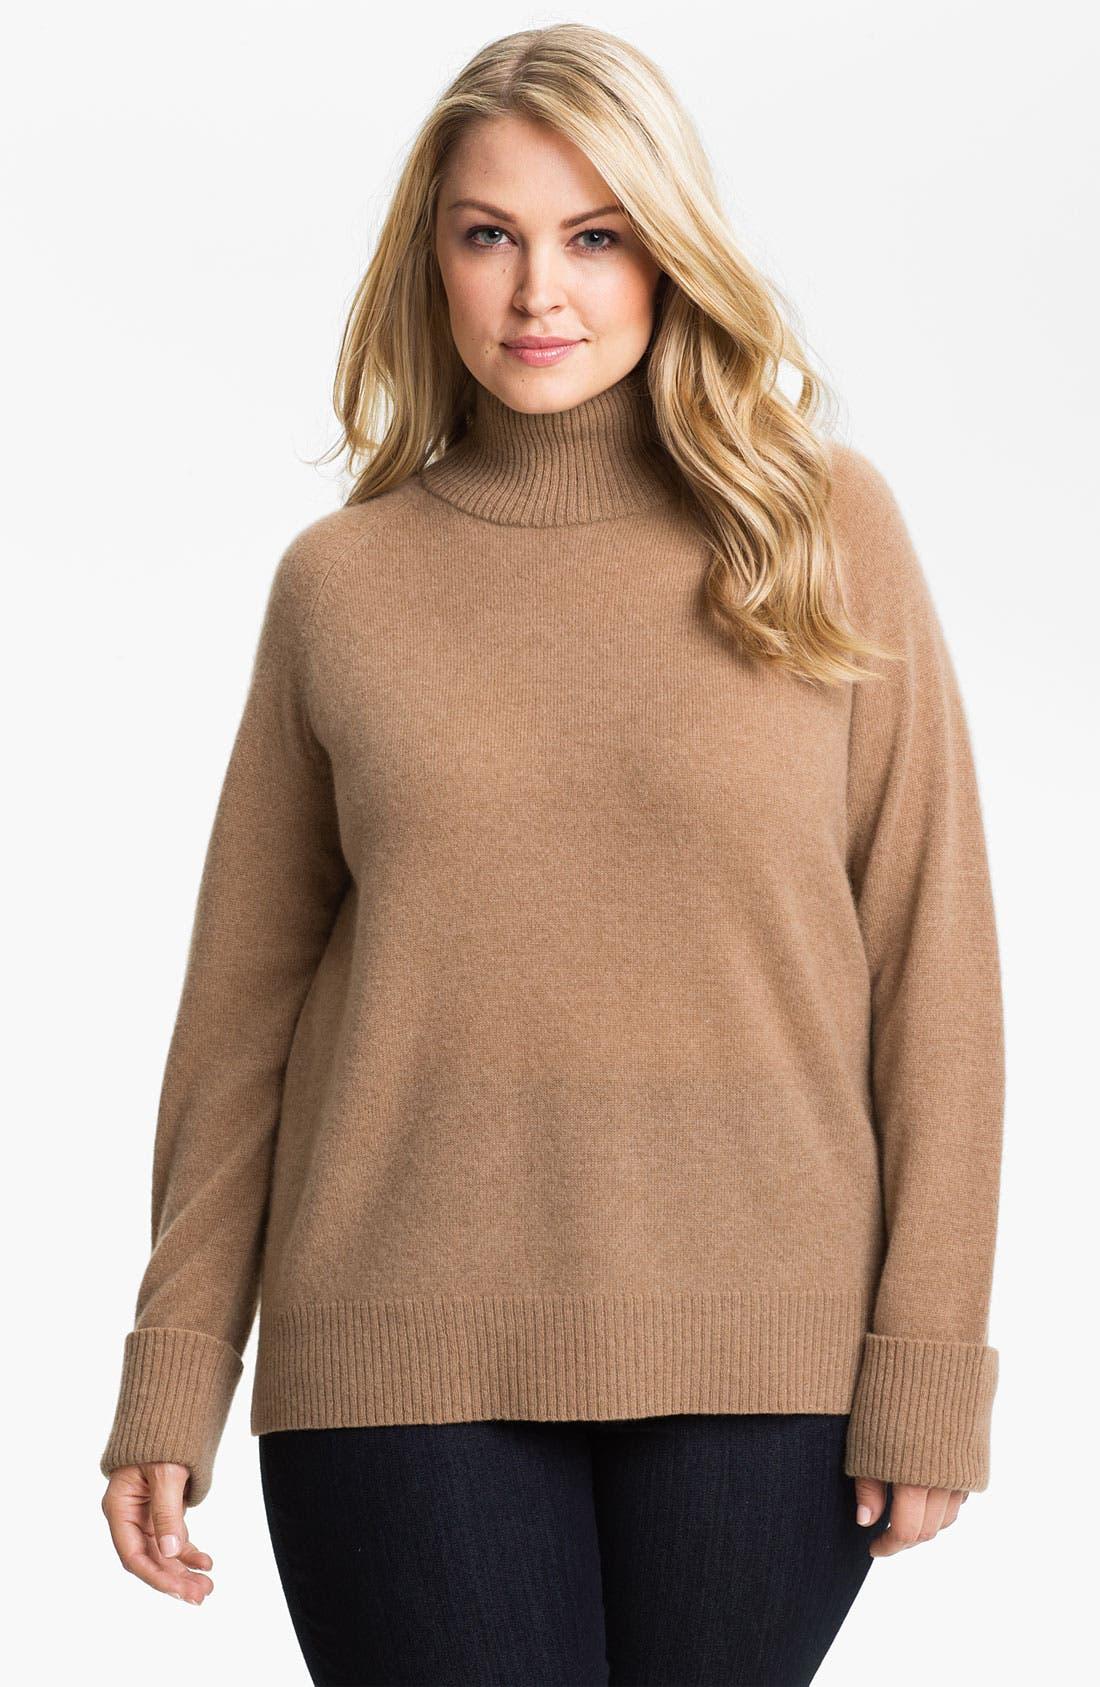 Alternate Image 1 Selected - Halogen® Mock Neck Cashmere Sweater (Plus)